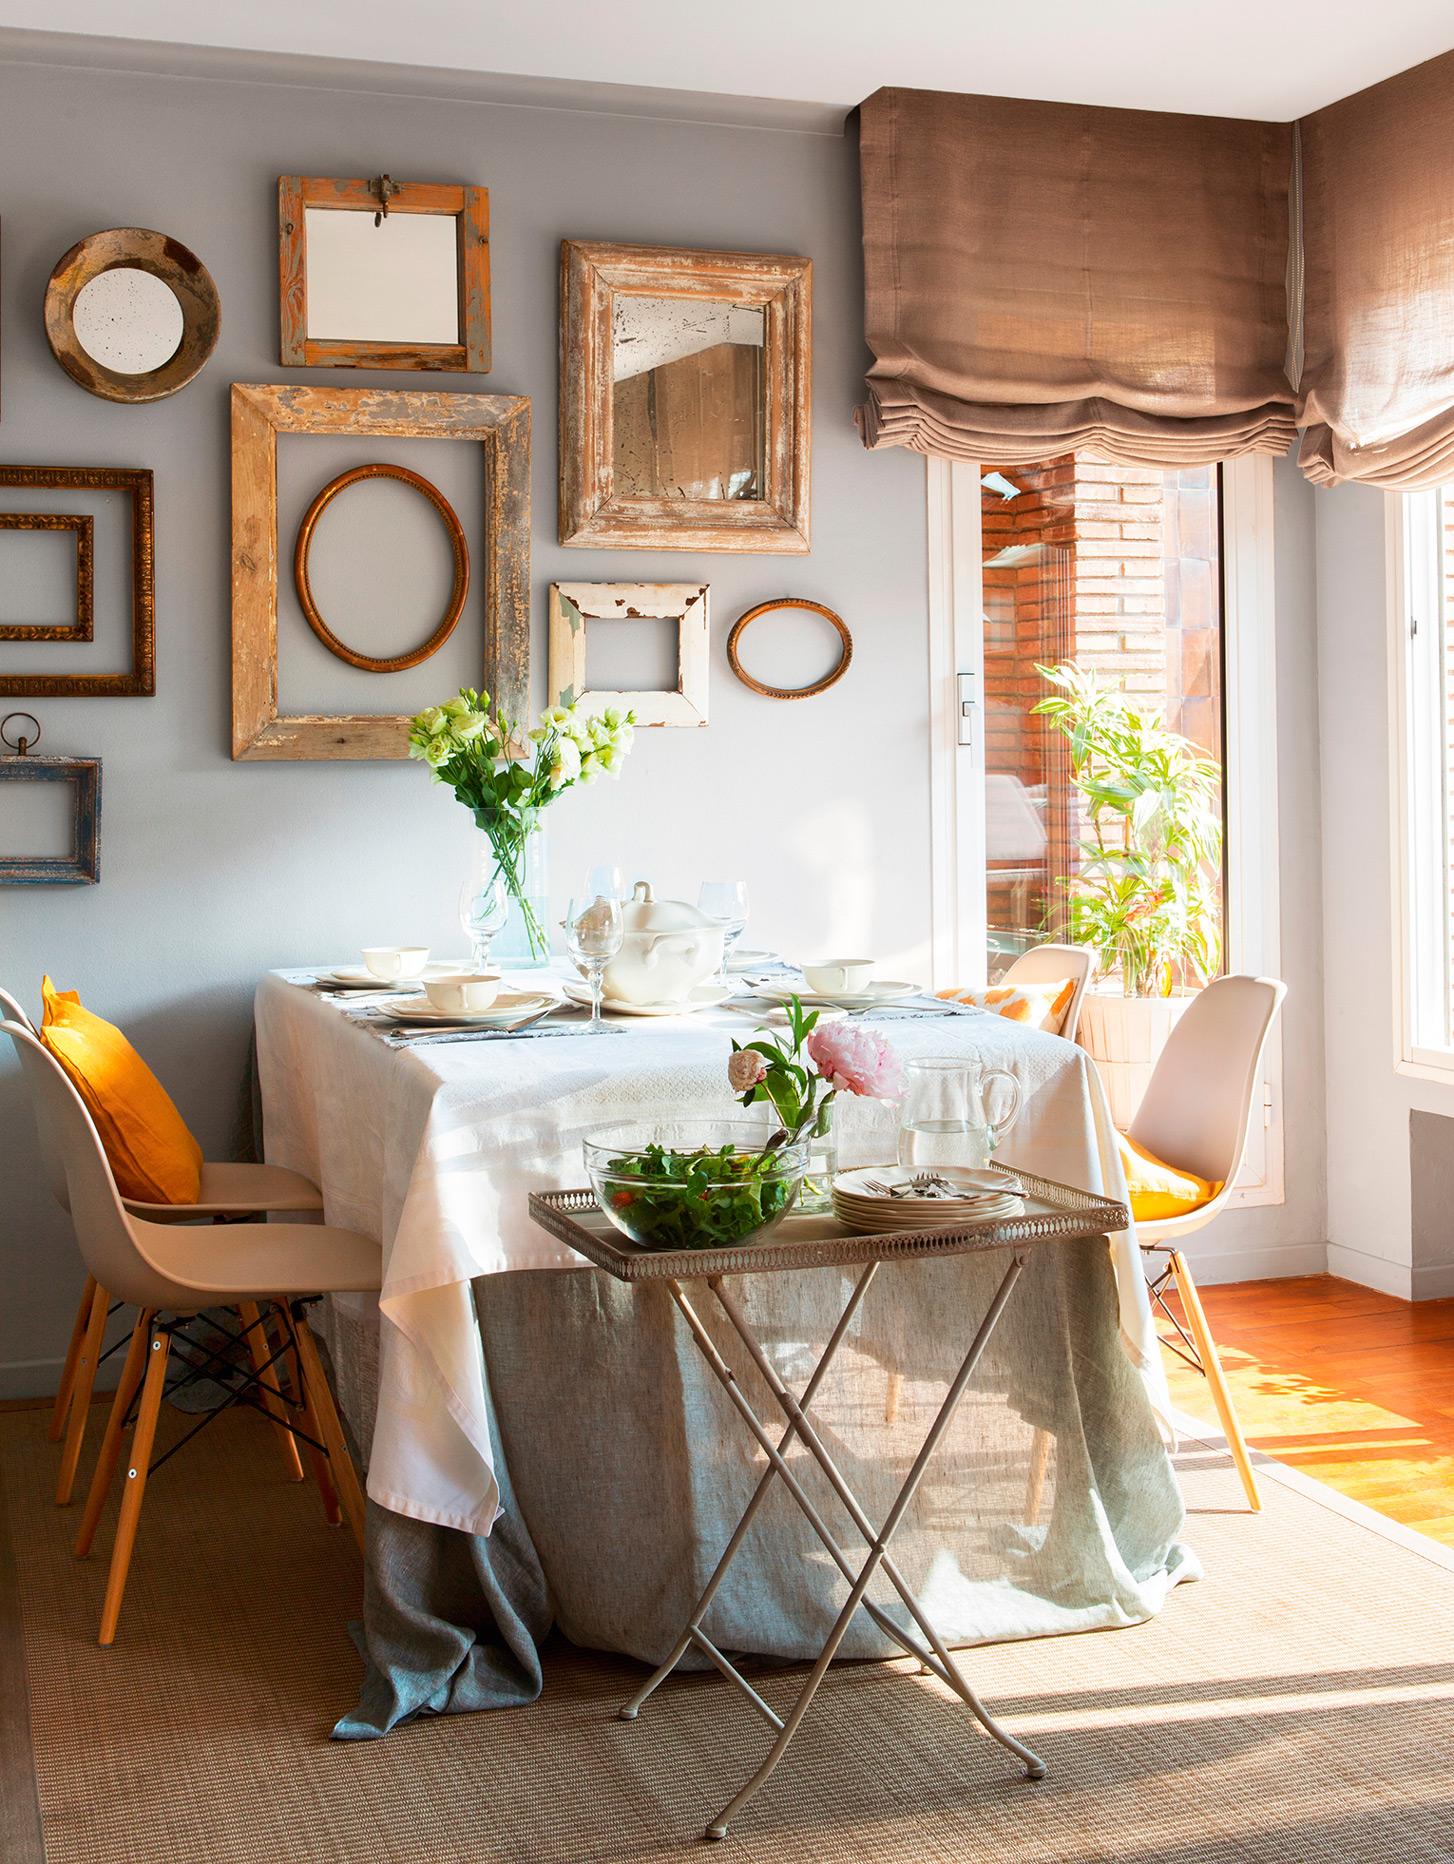 Comedores para espacios pequeños